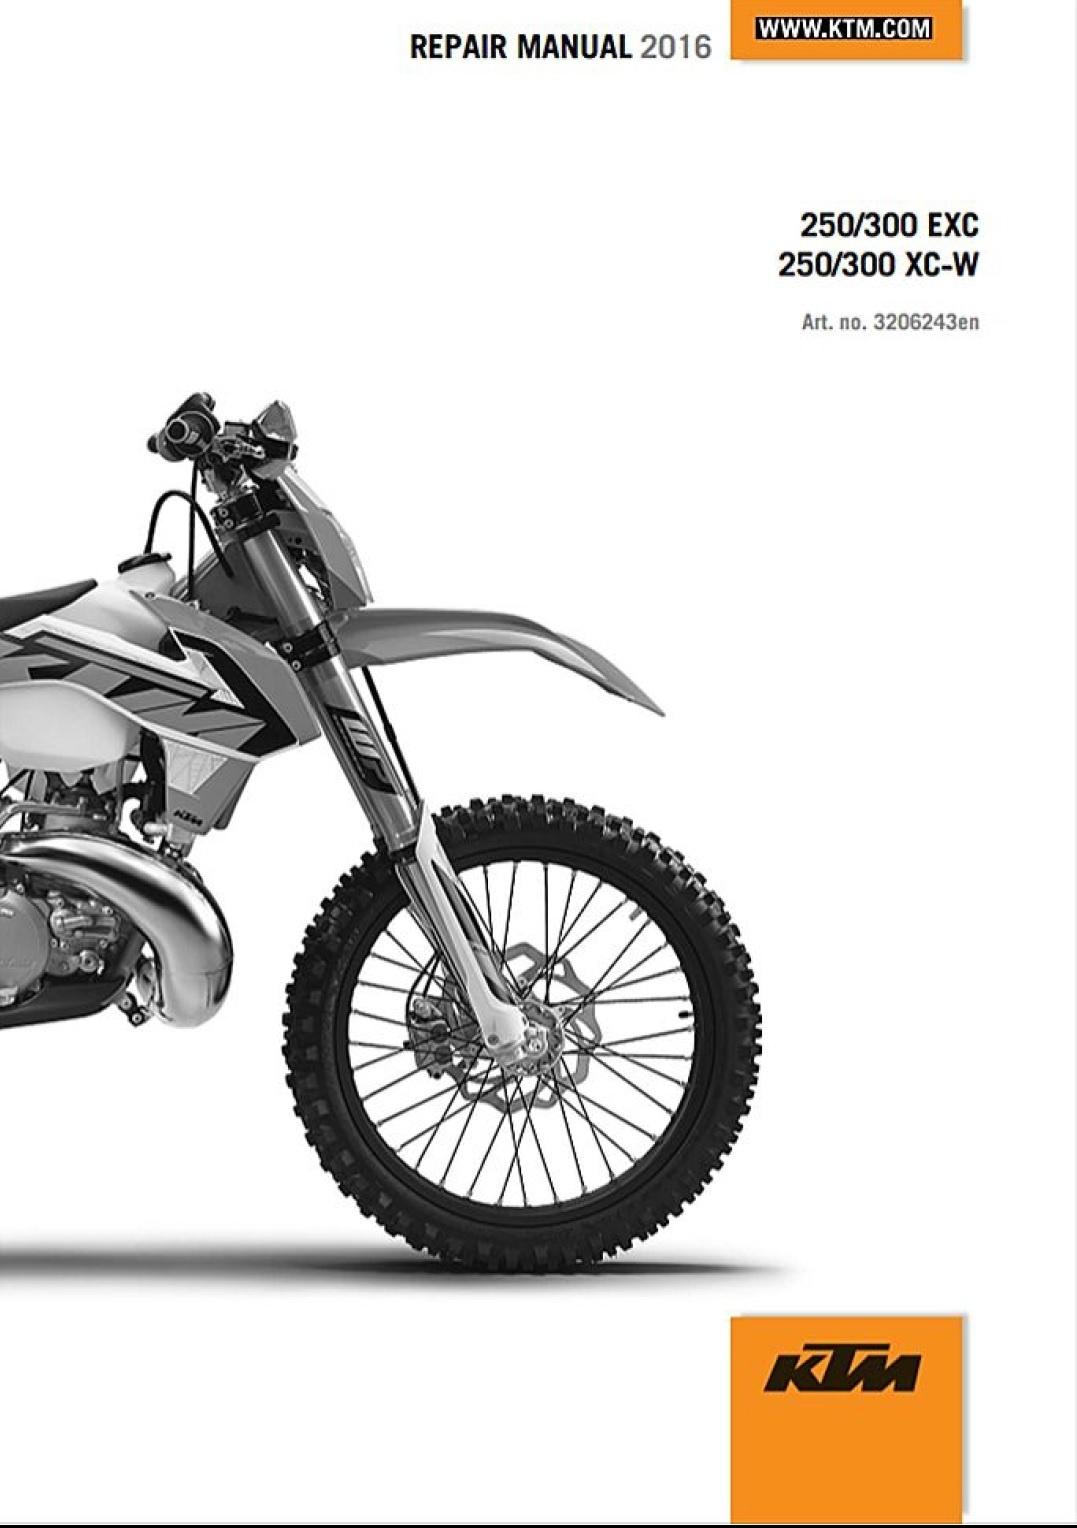 ktm 250 300 exc xc-w service repair manual